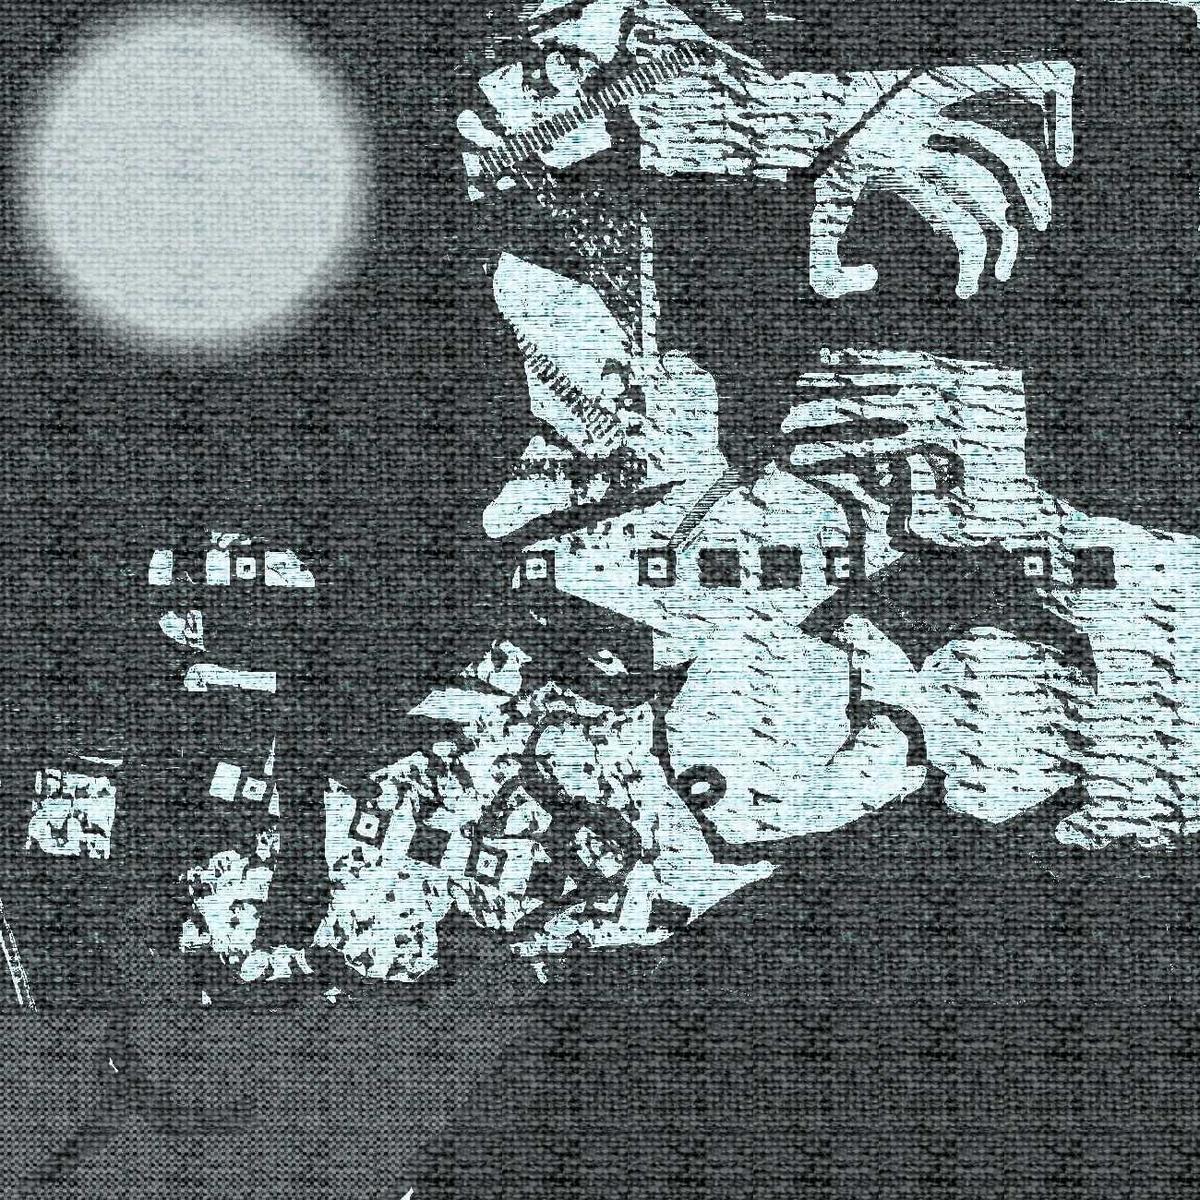 f:id:iwasisanma:20200225163822j:plain